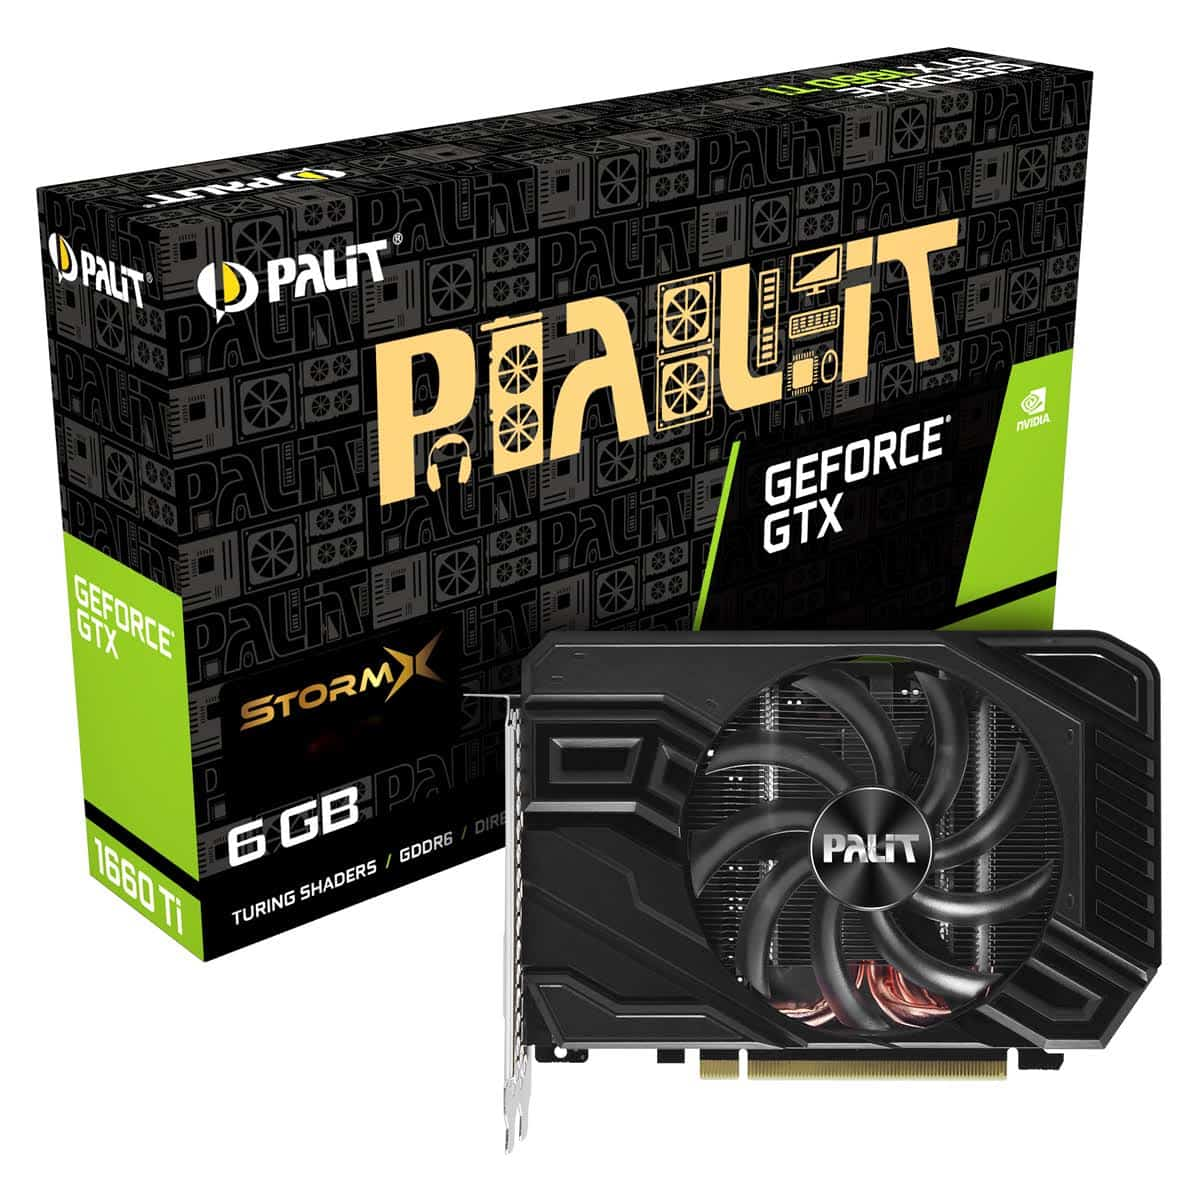 Palit GTX1660 Ti StormX, 6GB DDR6, DVI, HDMI, DP, 1770MHz Clock, Compact Design